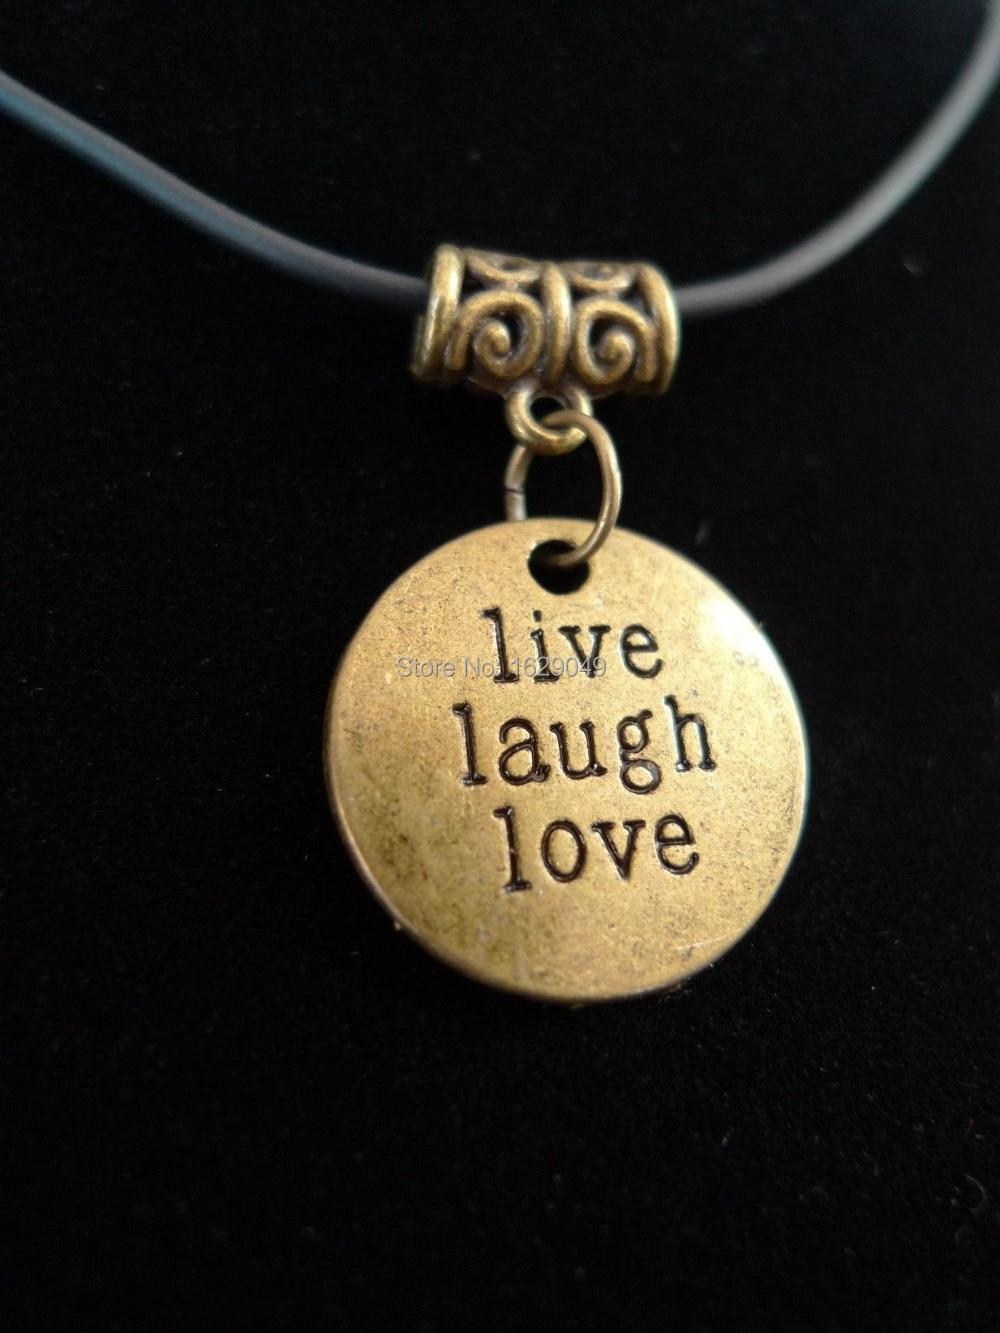 10PCS Fashion Vintage Alloy Bronze Tone <font><b>Live</b></font> Laugh <font><b>Love</b></font> <font><b>Enjoy</b></font> <font><b>Life</b></font> Necklace&Pendants Women Jewelry DIYX838